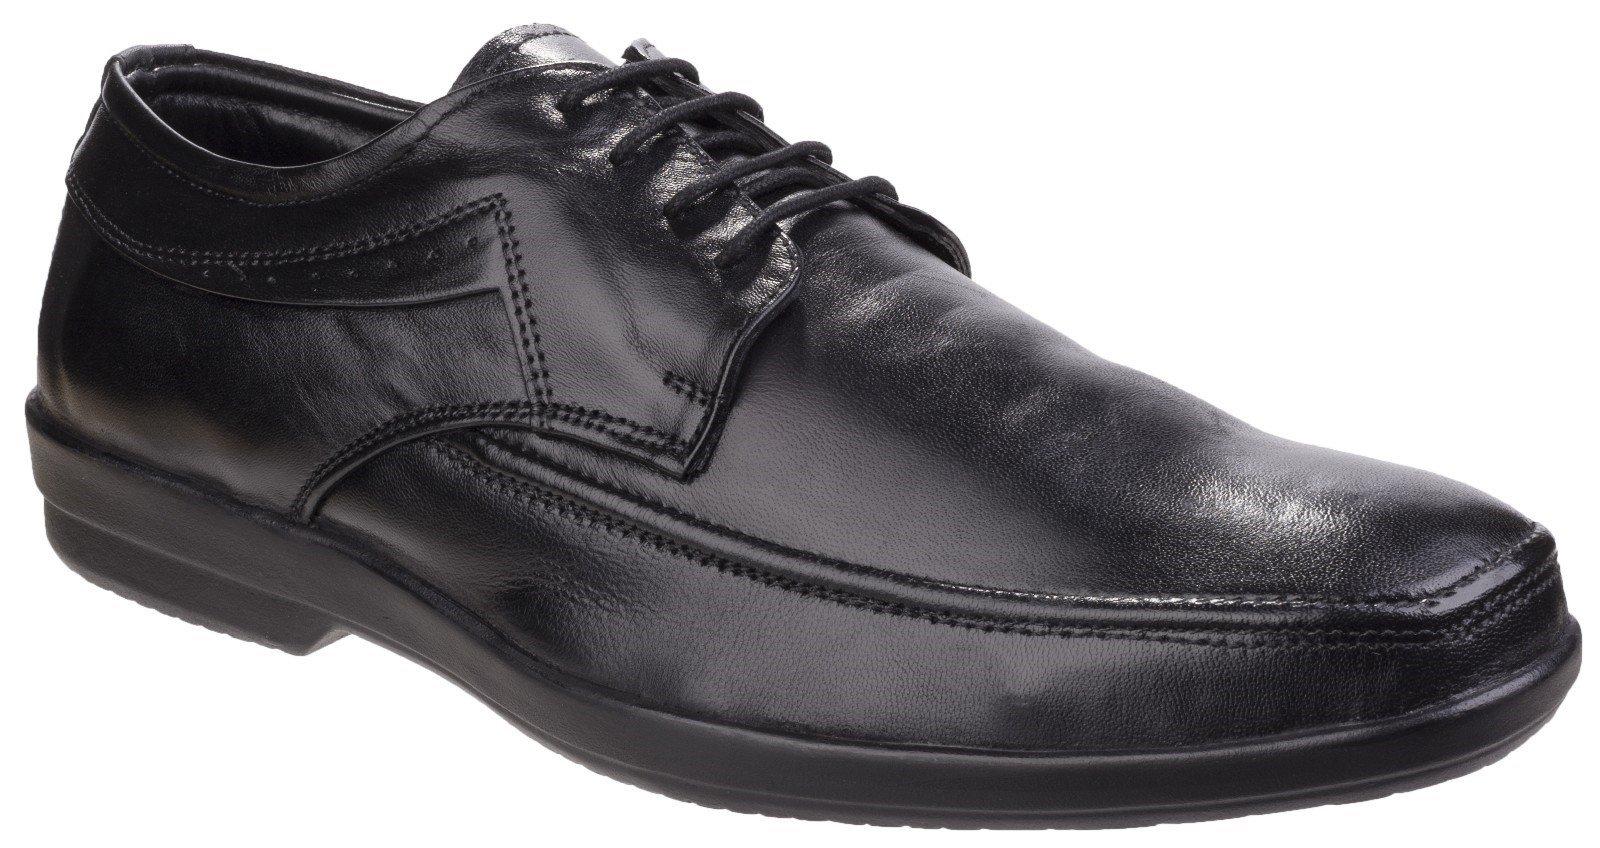 Fleet & Foster Men's Dave Apron Toe Formal Shoe Black 24951-41295 - Black 6